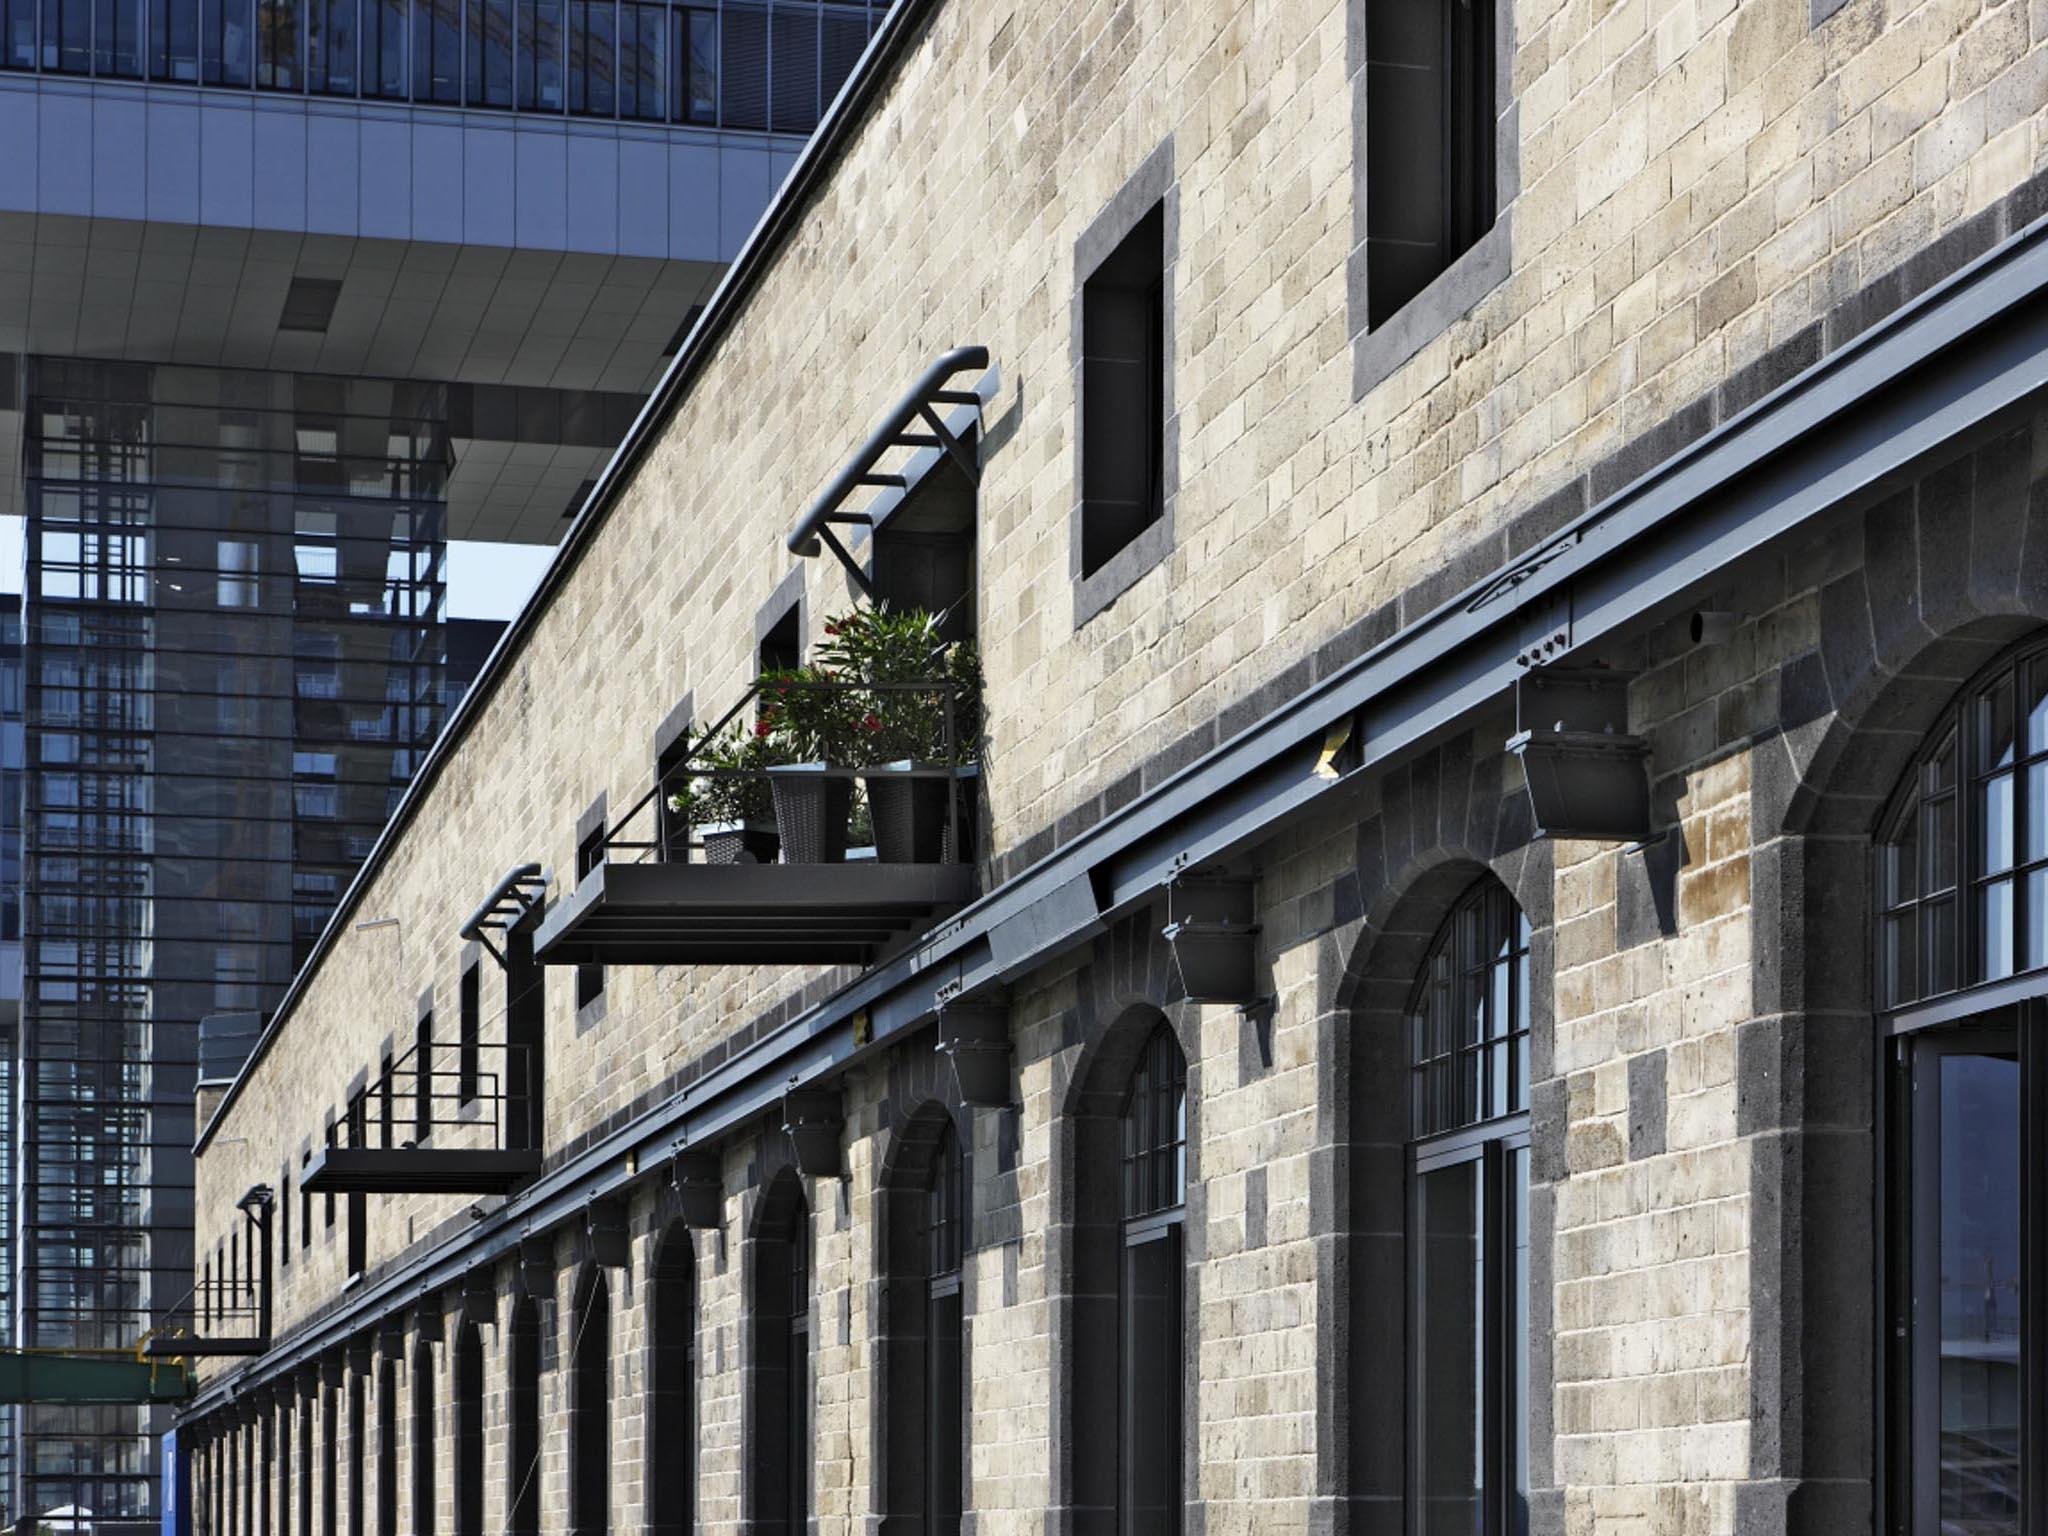 Fassade modernisierter Kontoren am Kölner Zollhafen